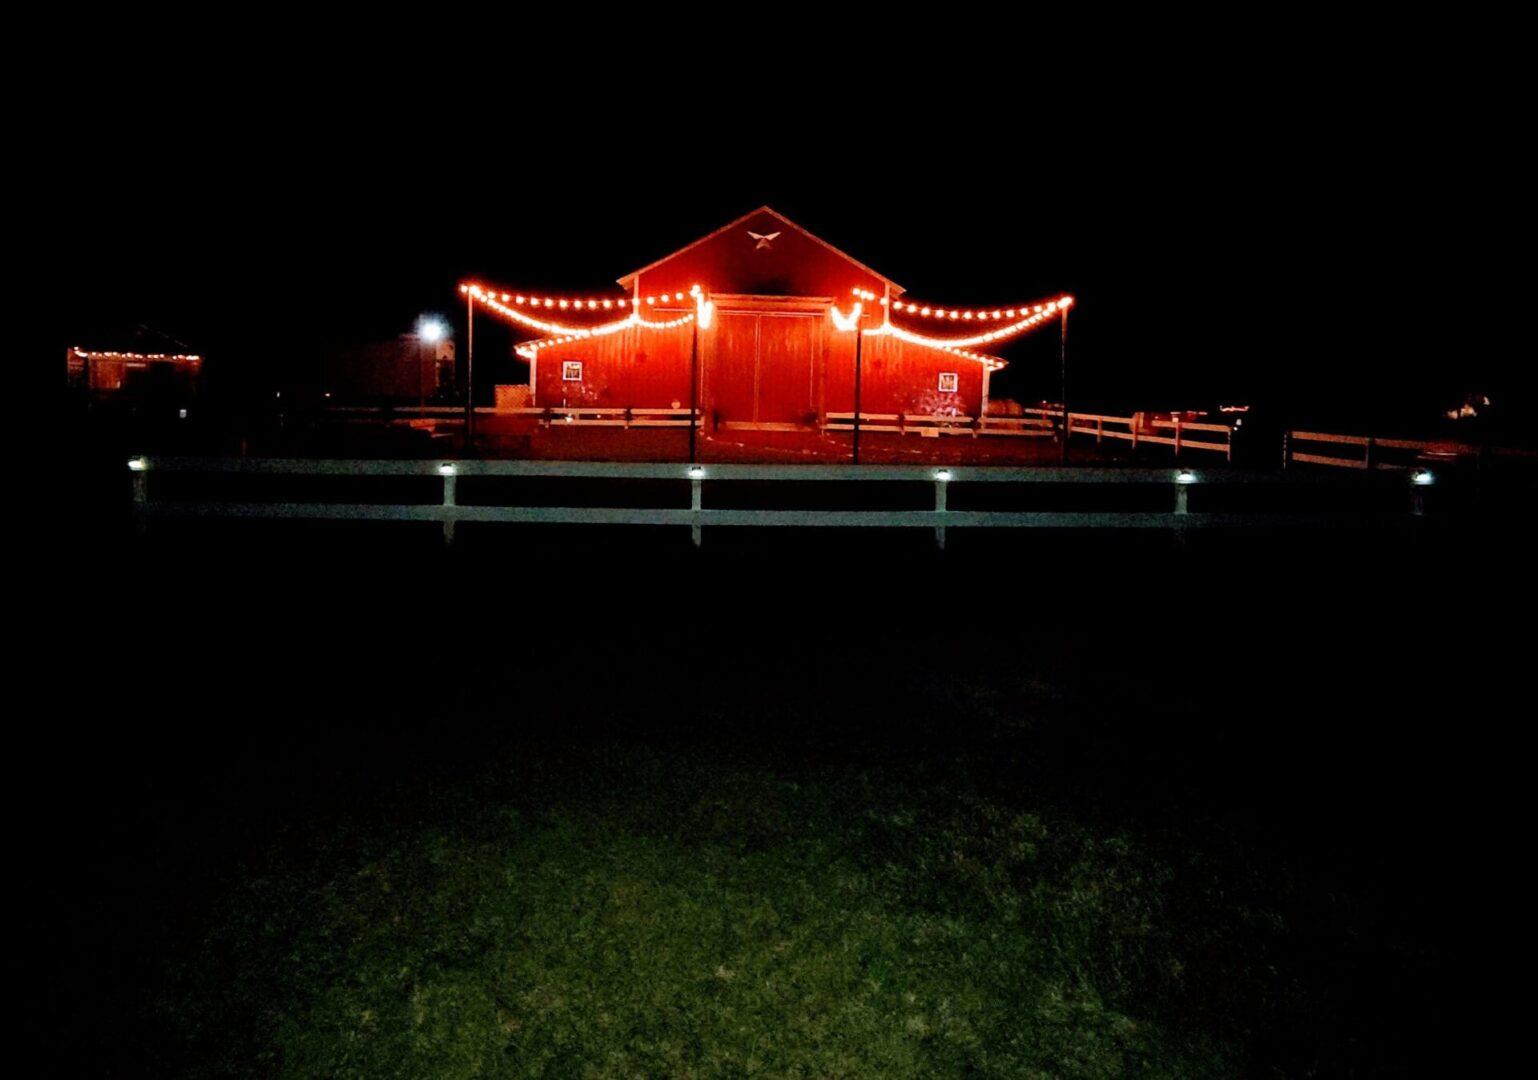 Barn after dark